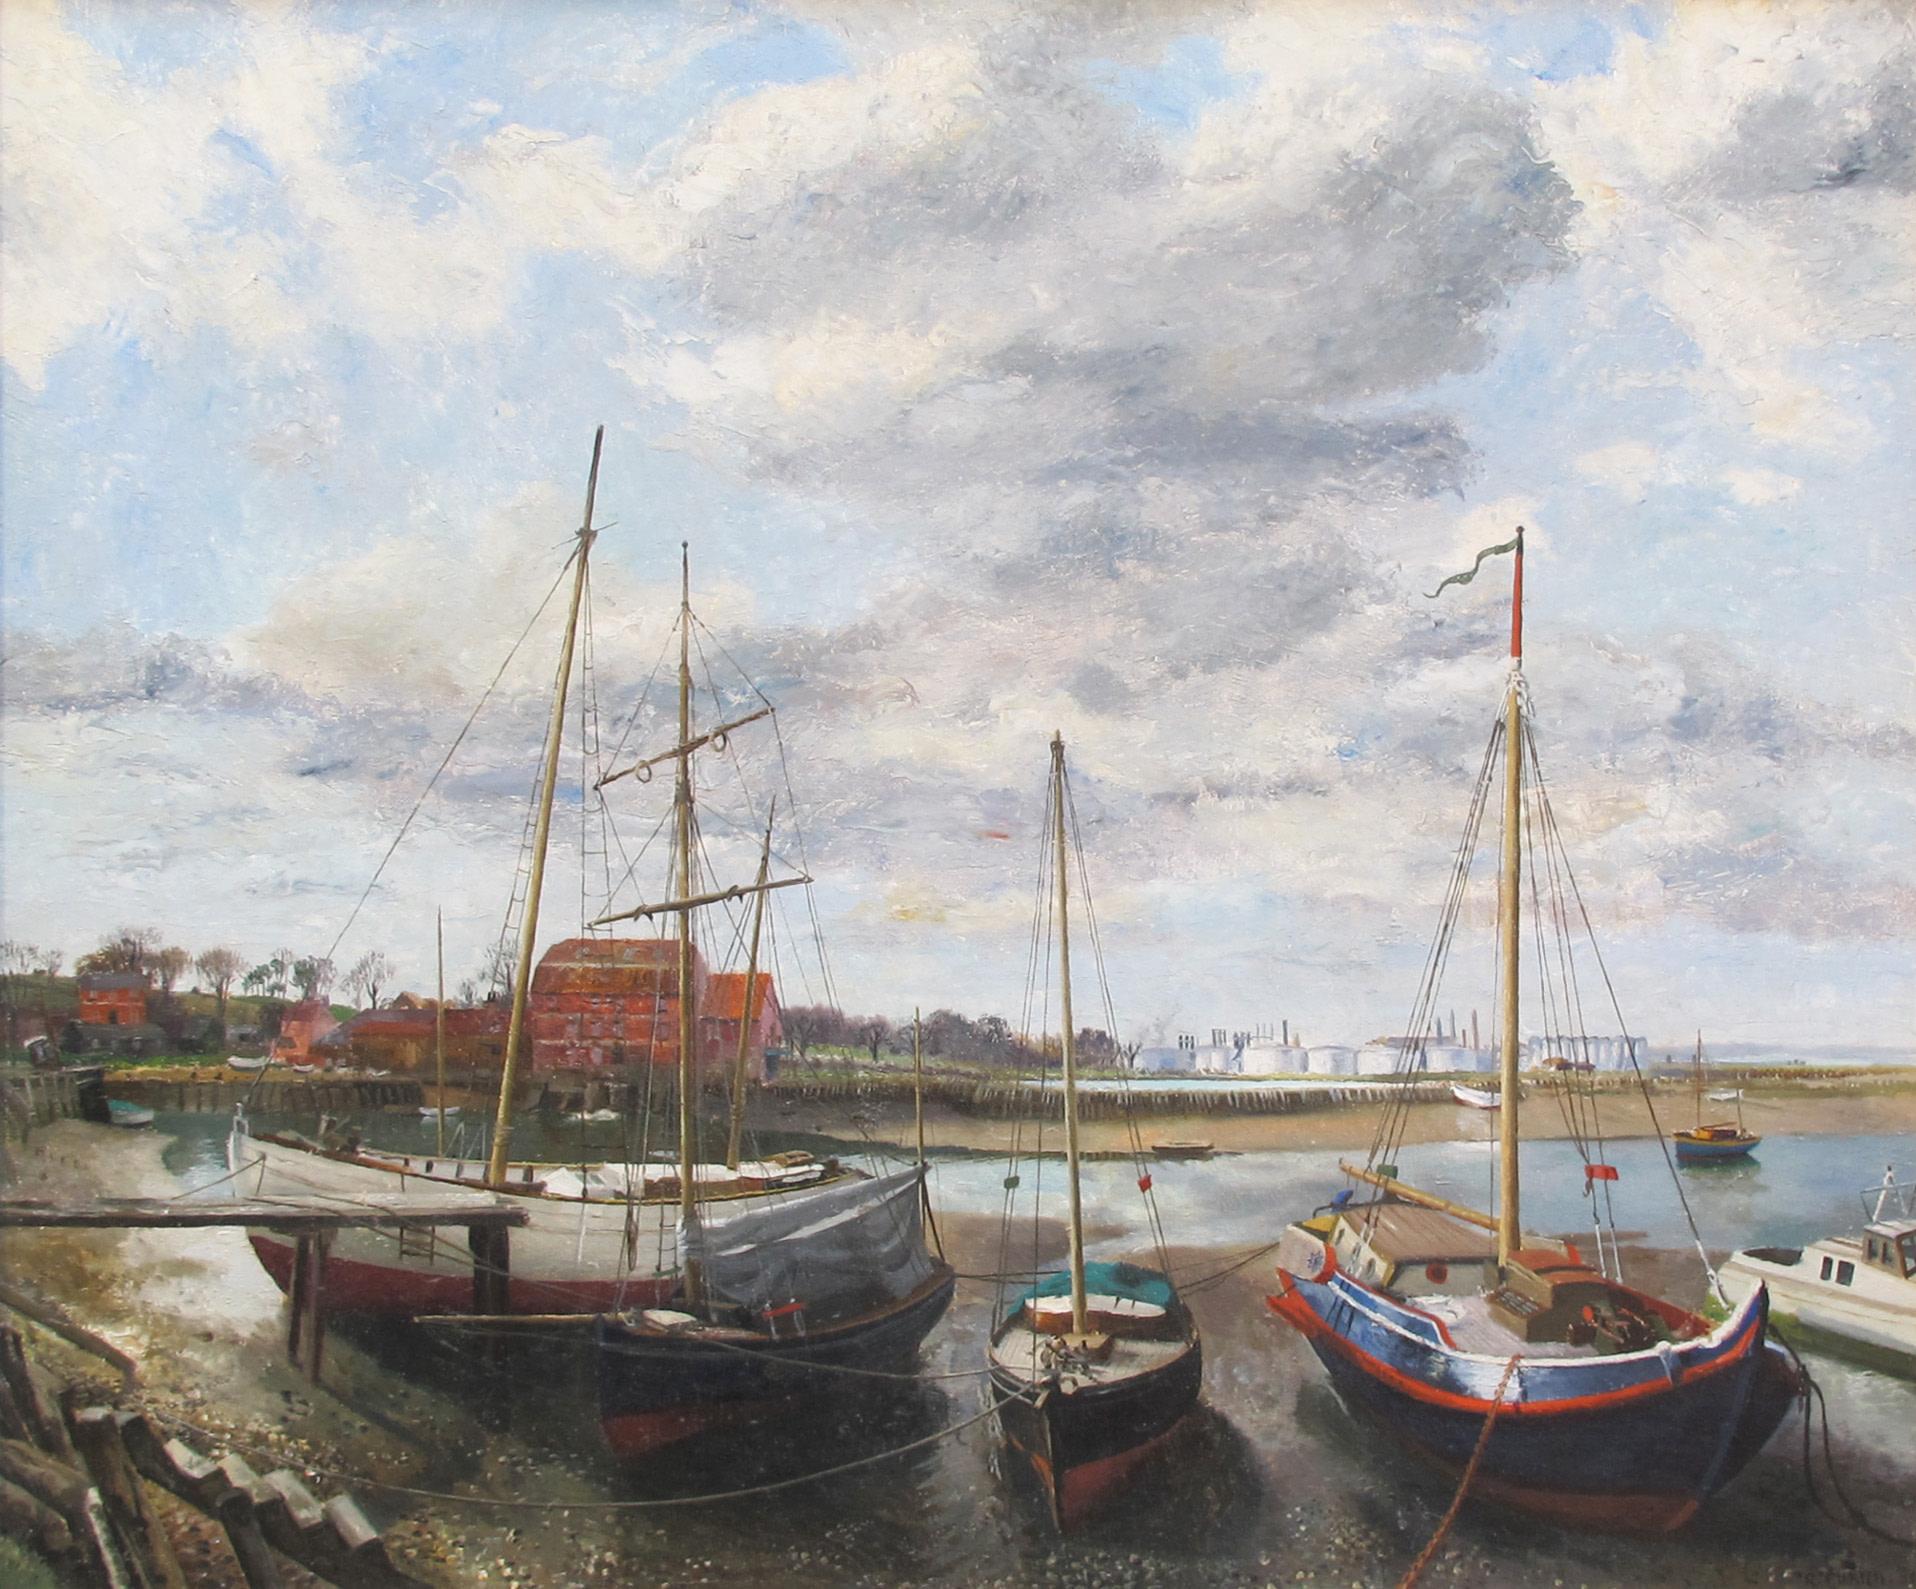 <span class=&#34;link fancybox-details-link&#34;><a href=&#34;/artists/42-richard-eurich/works/765/&#34;>View Detail Page</a></span><div class=&#34;artist&#34;><strong>Richard Eurich</strong></div> 1903-1992 <div class=&#34;title&#34;><em>Fawley Beach</em></div> <div class=&#34;signed_and_dated&#34;>signed and dated '39<br /> title inscribed on stretcher</div> <div class=&#34;medium&#34;>oil on canvas</div> <div class=&#34;dimensions&#34;>63.5 x 76 cms (25 x 30 ins)</div>